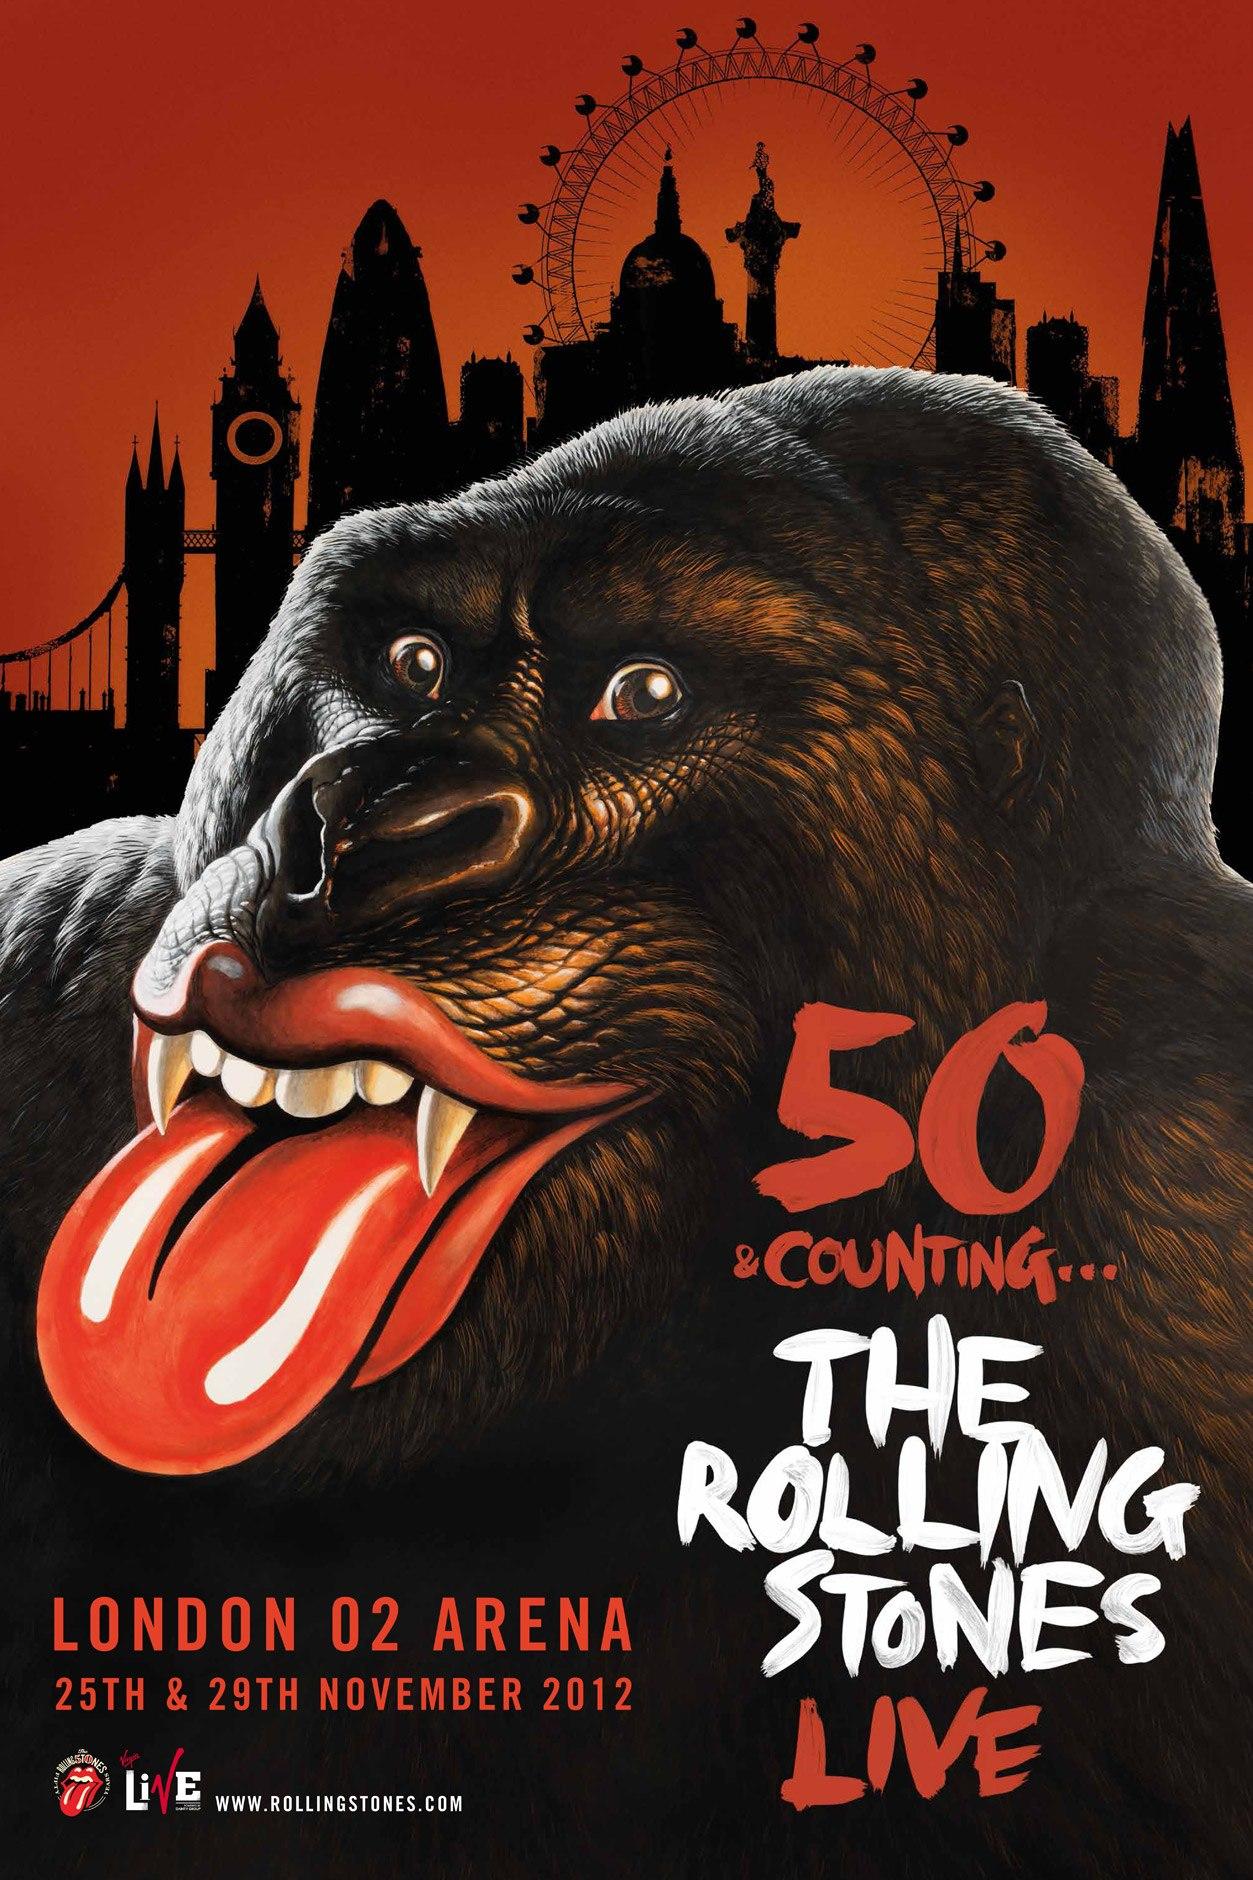 Rolling stones tour dates